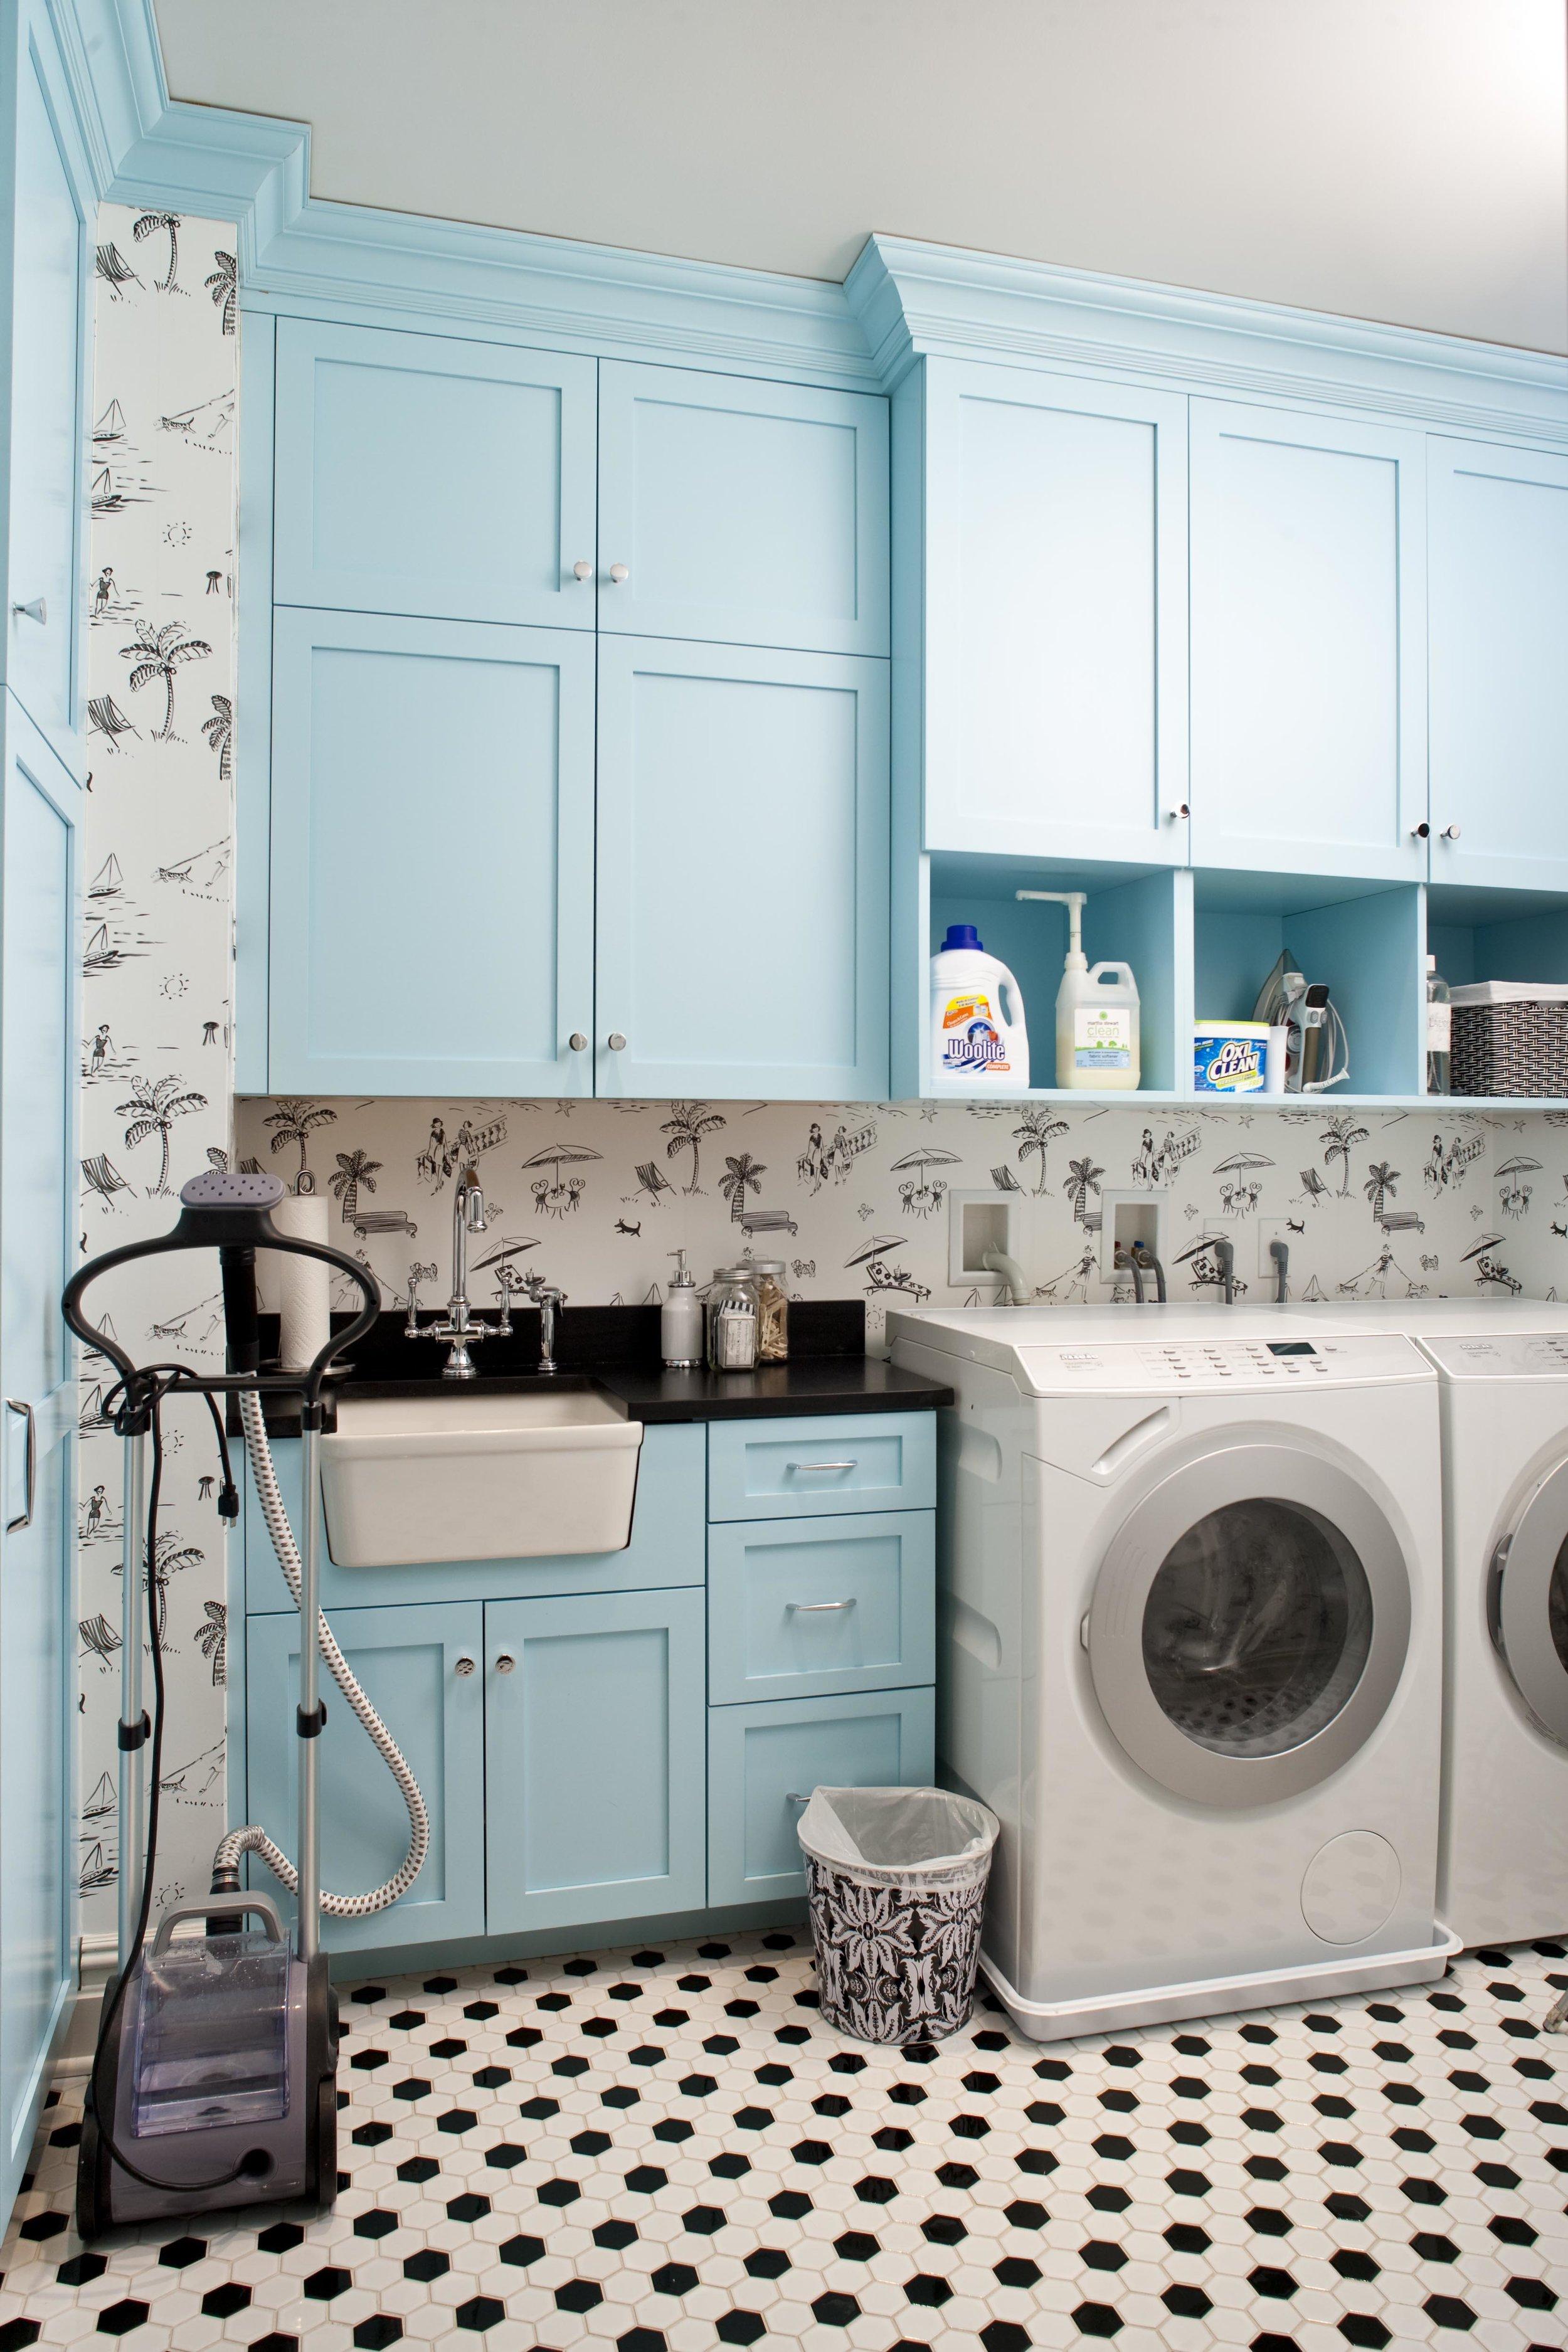 U_Mosle_Laundry_1192.jpg